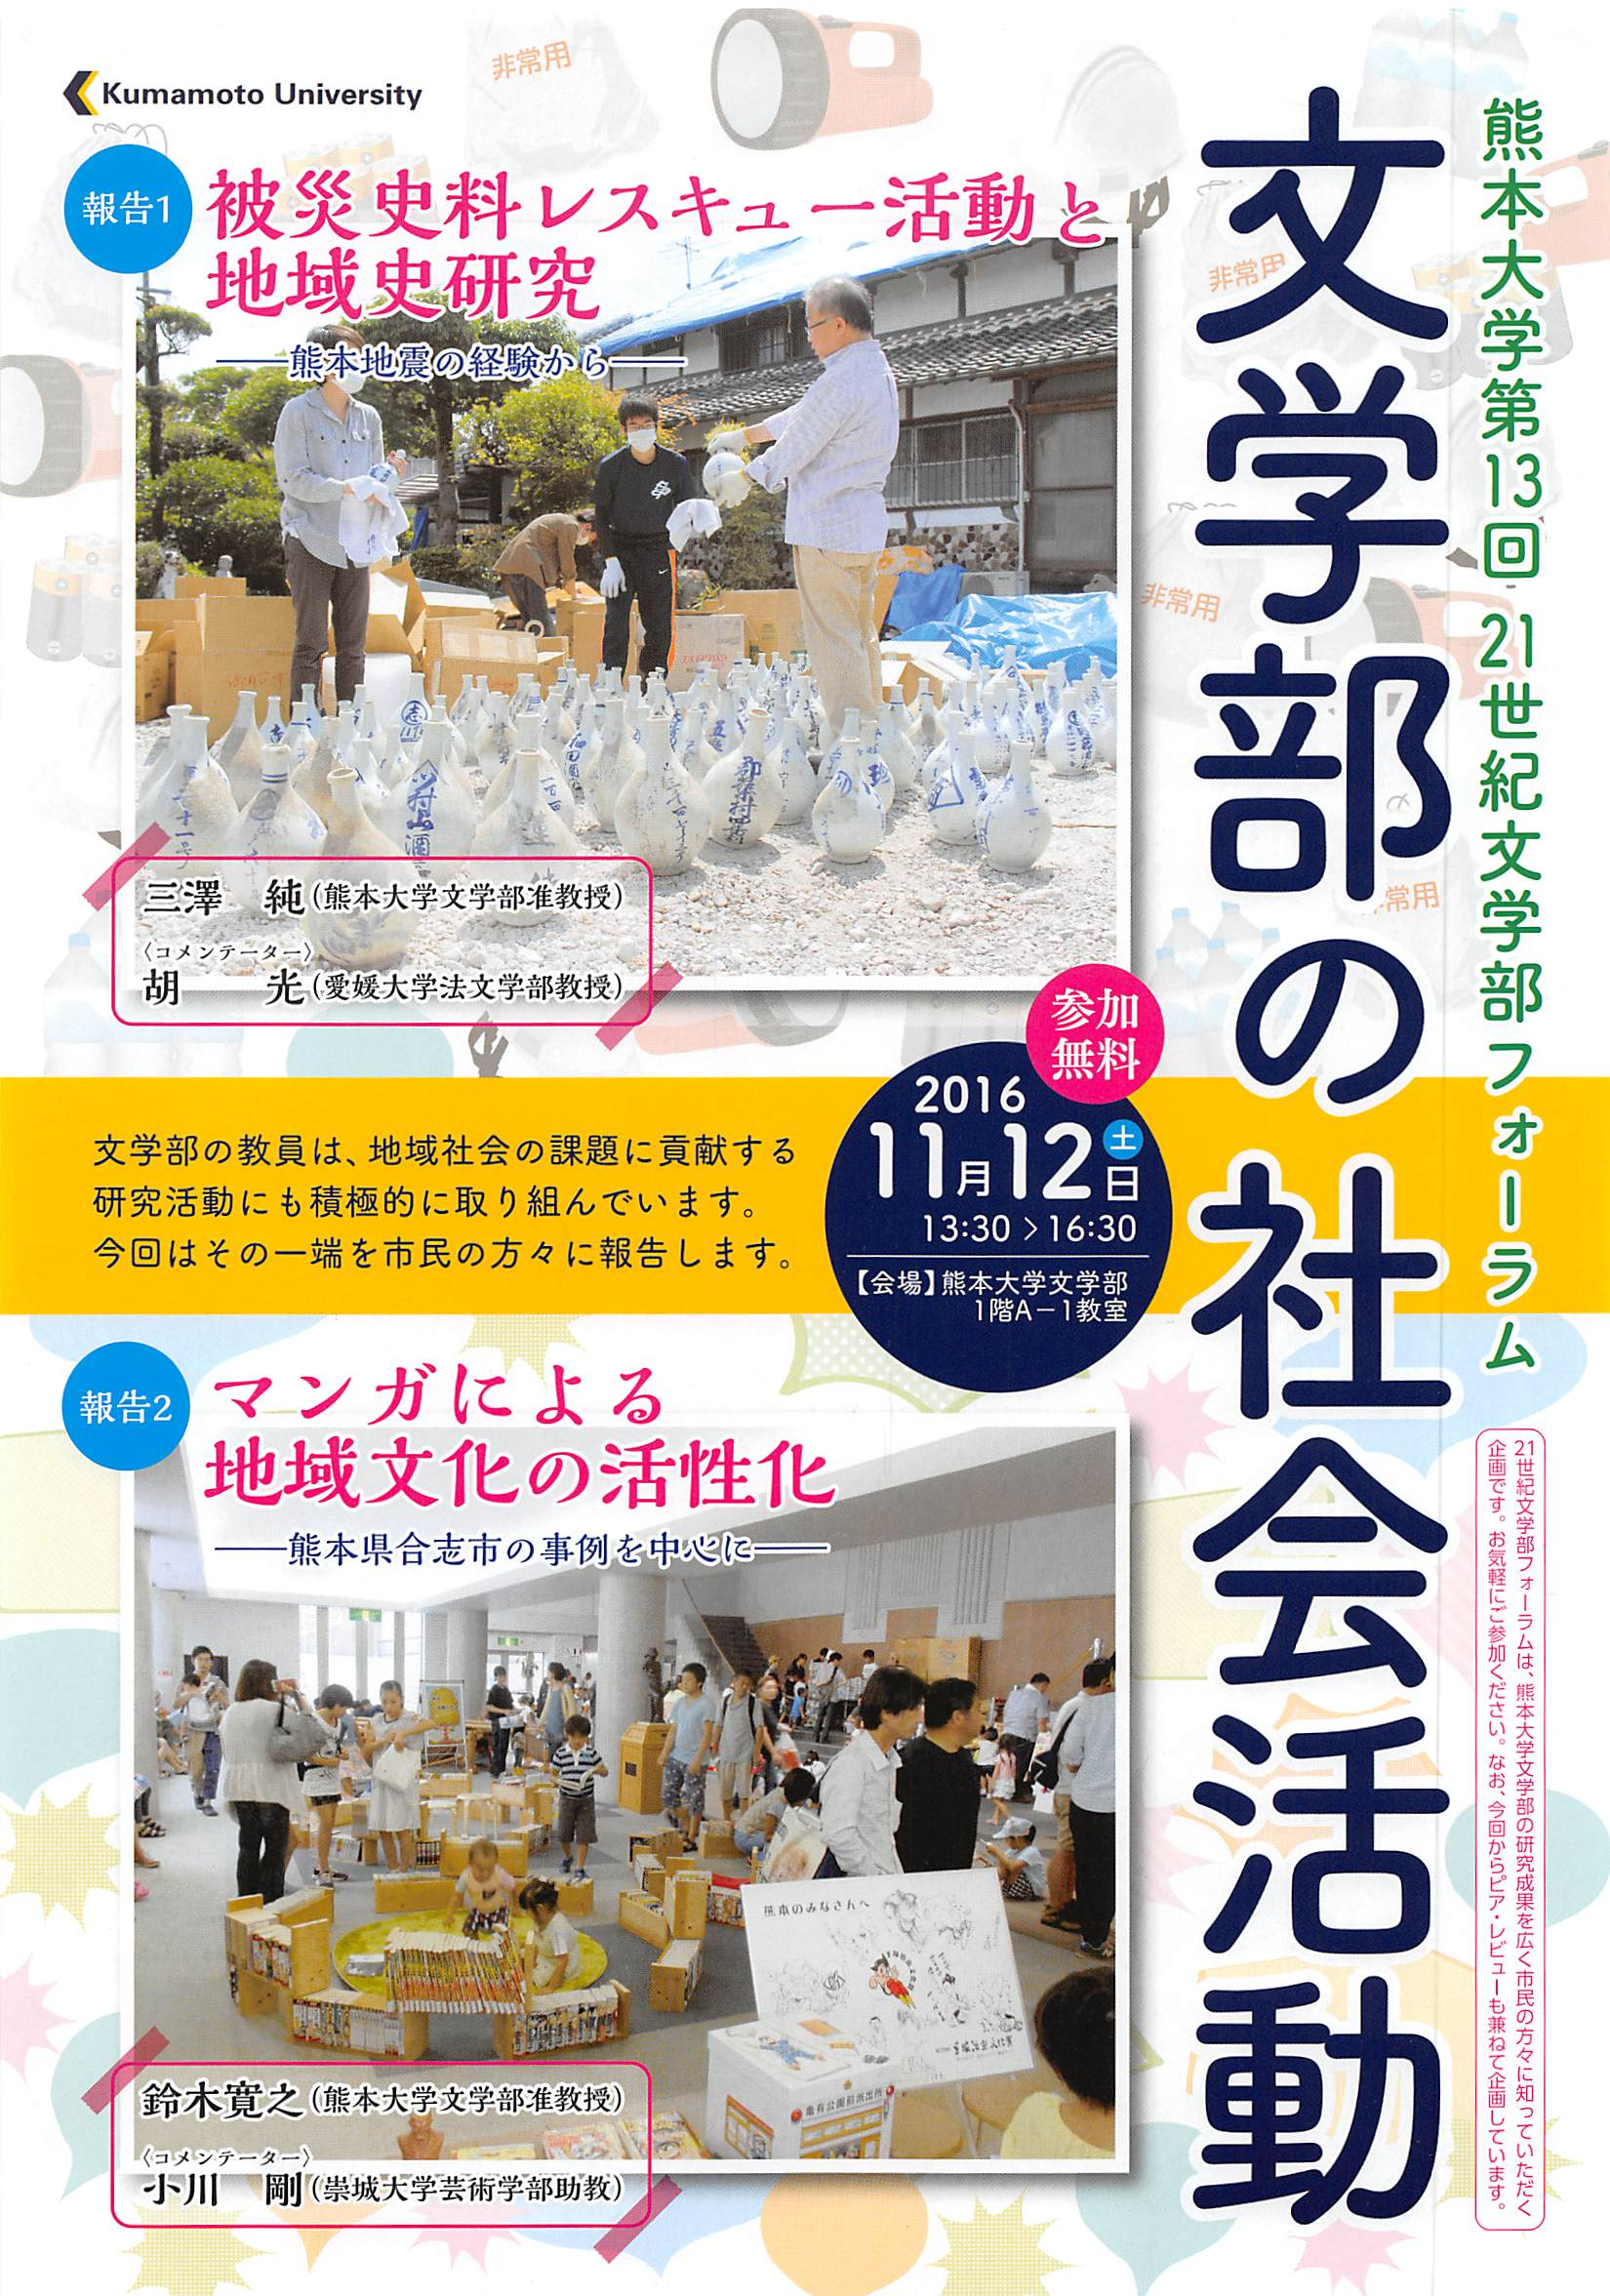 http://www.let.kumamoto-u.ac.jp/event/images/2016-forum.jpg